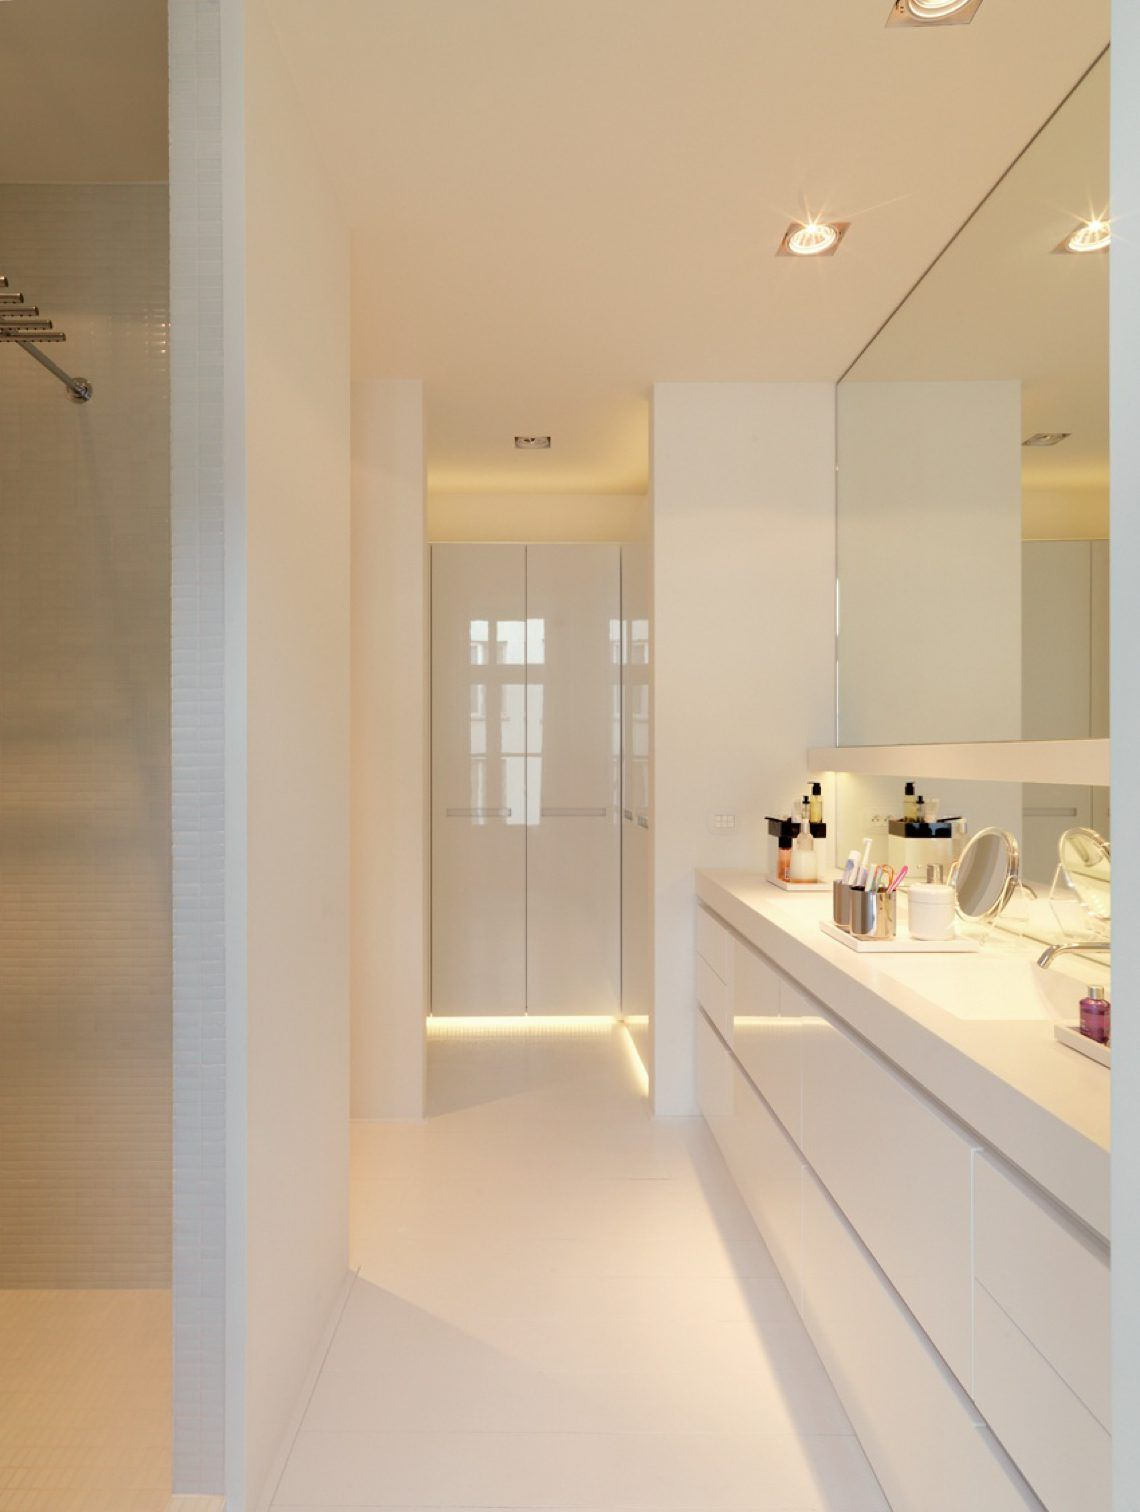 Pingl Par Jane Gigi Sibal Sur Bathroom Pinterest Sdb Salle De